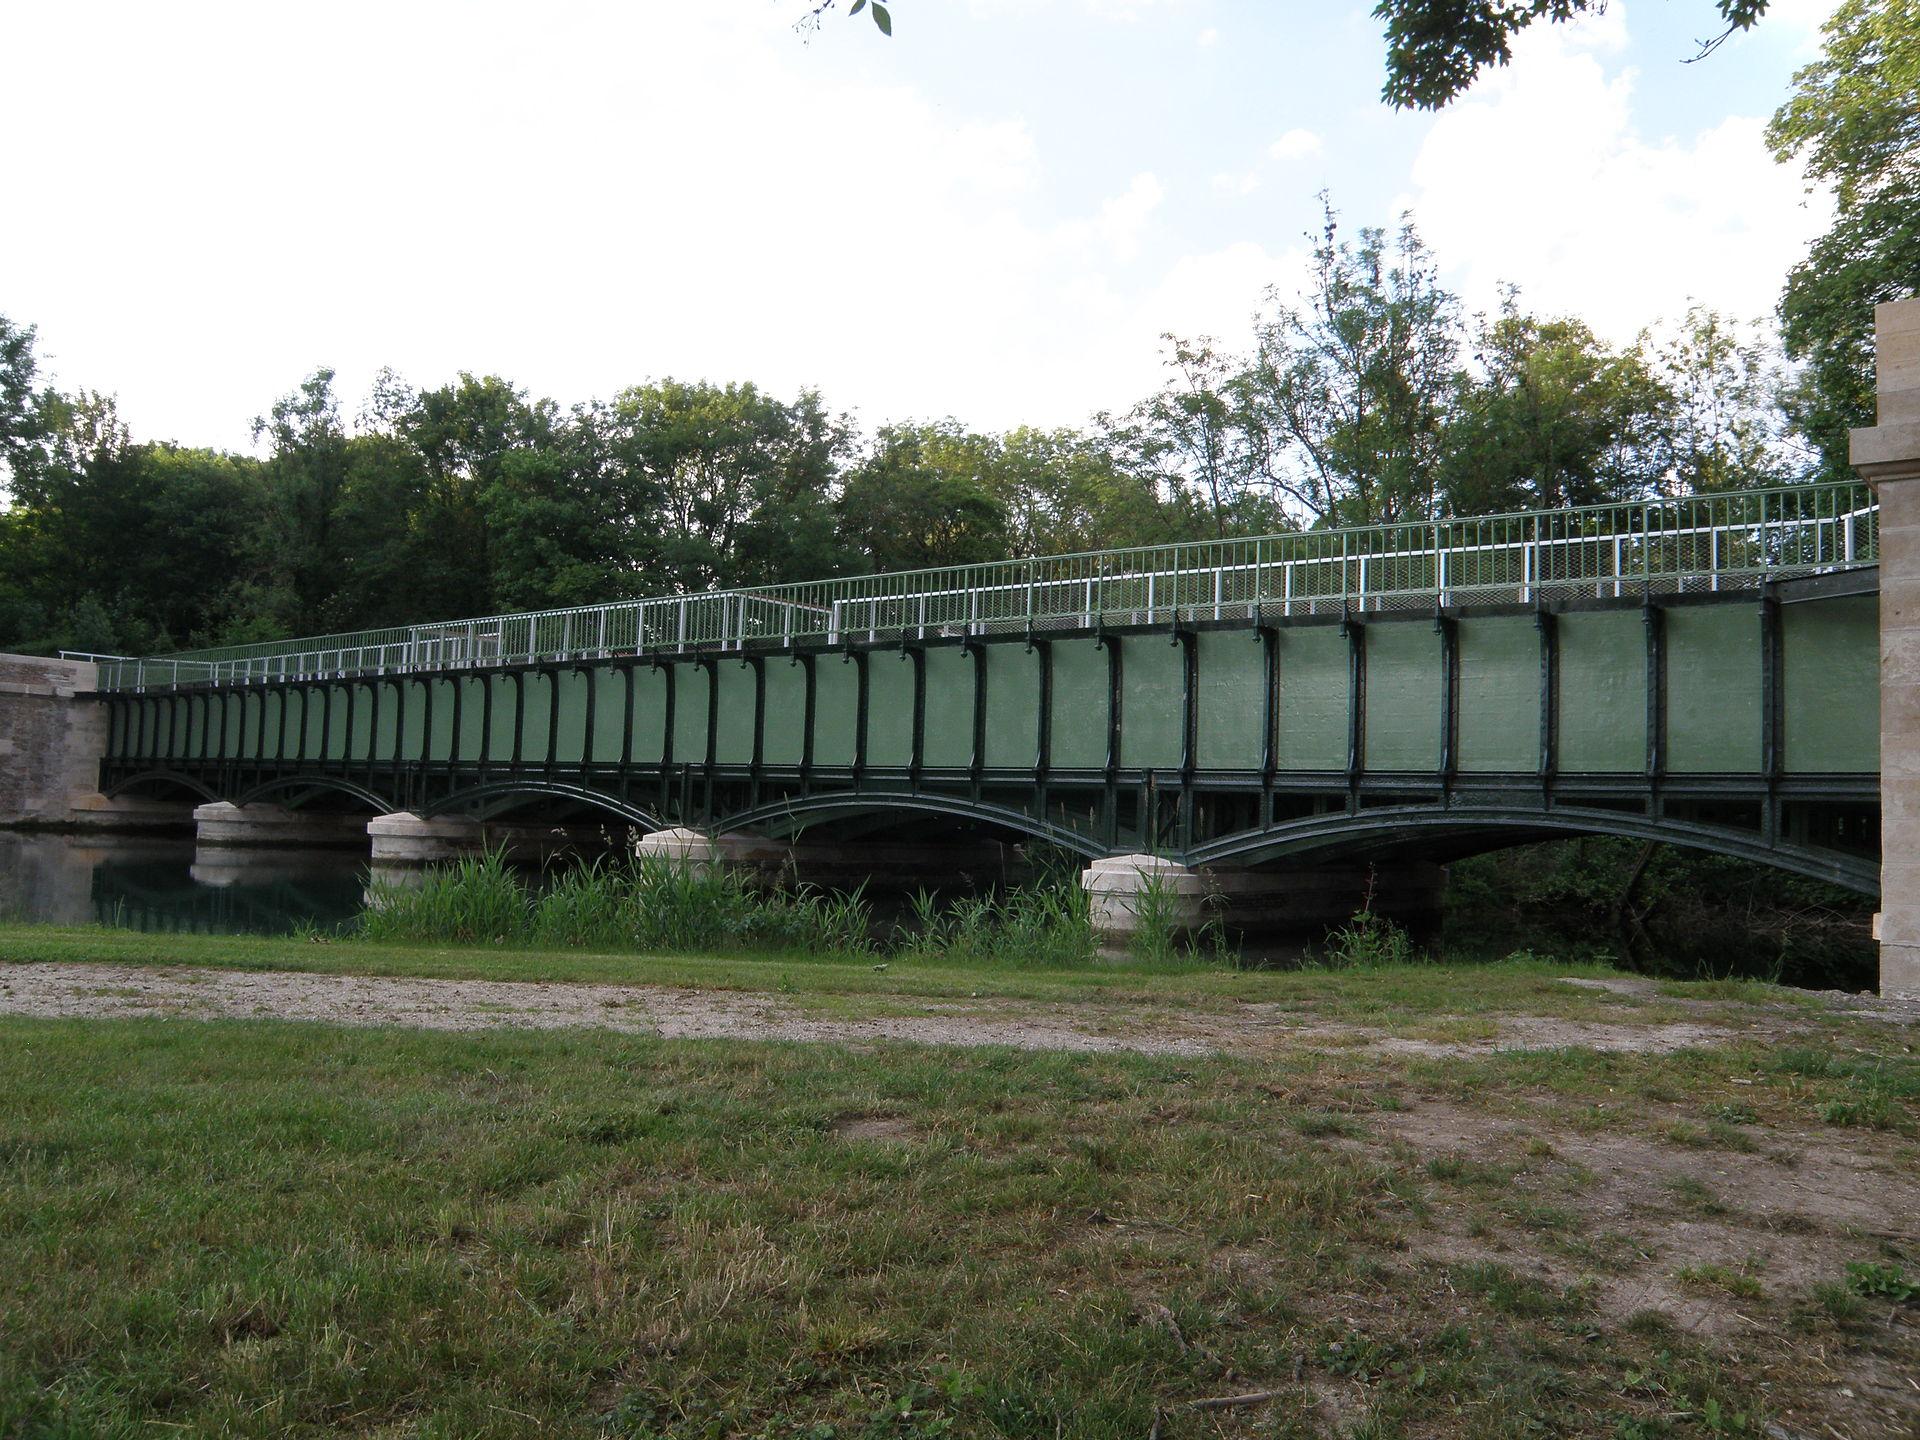 pont canal de barberey saint sulpice wikip dia. Black Bedroom Furniture Sets. Home Design Ideas